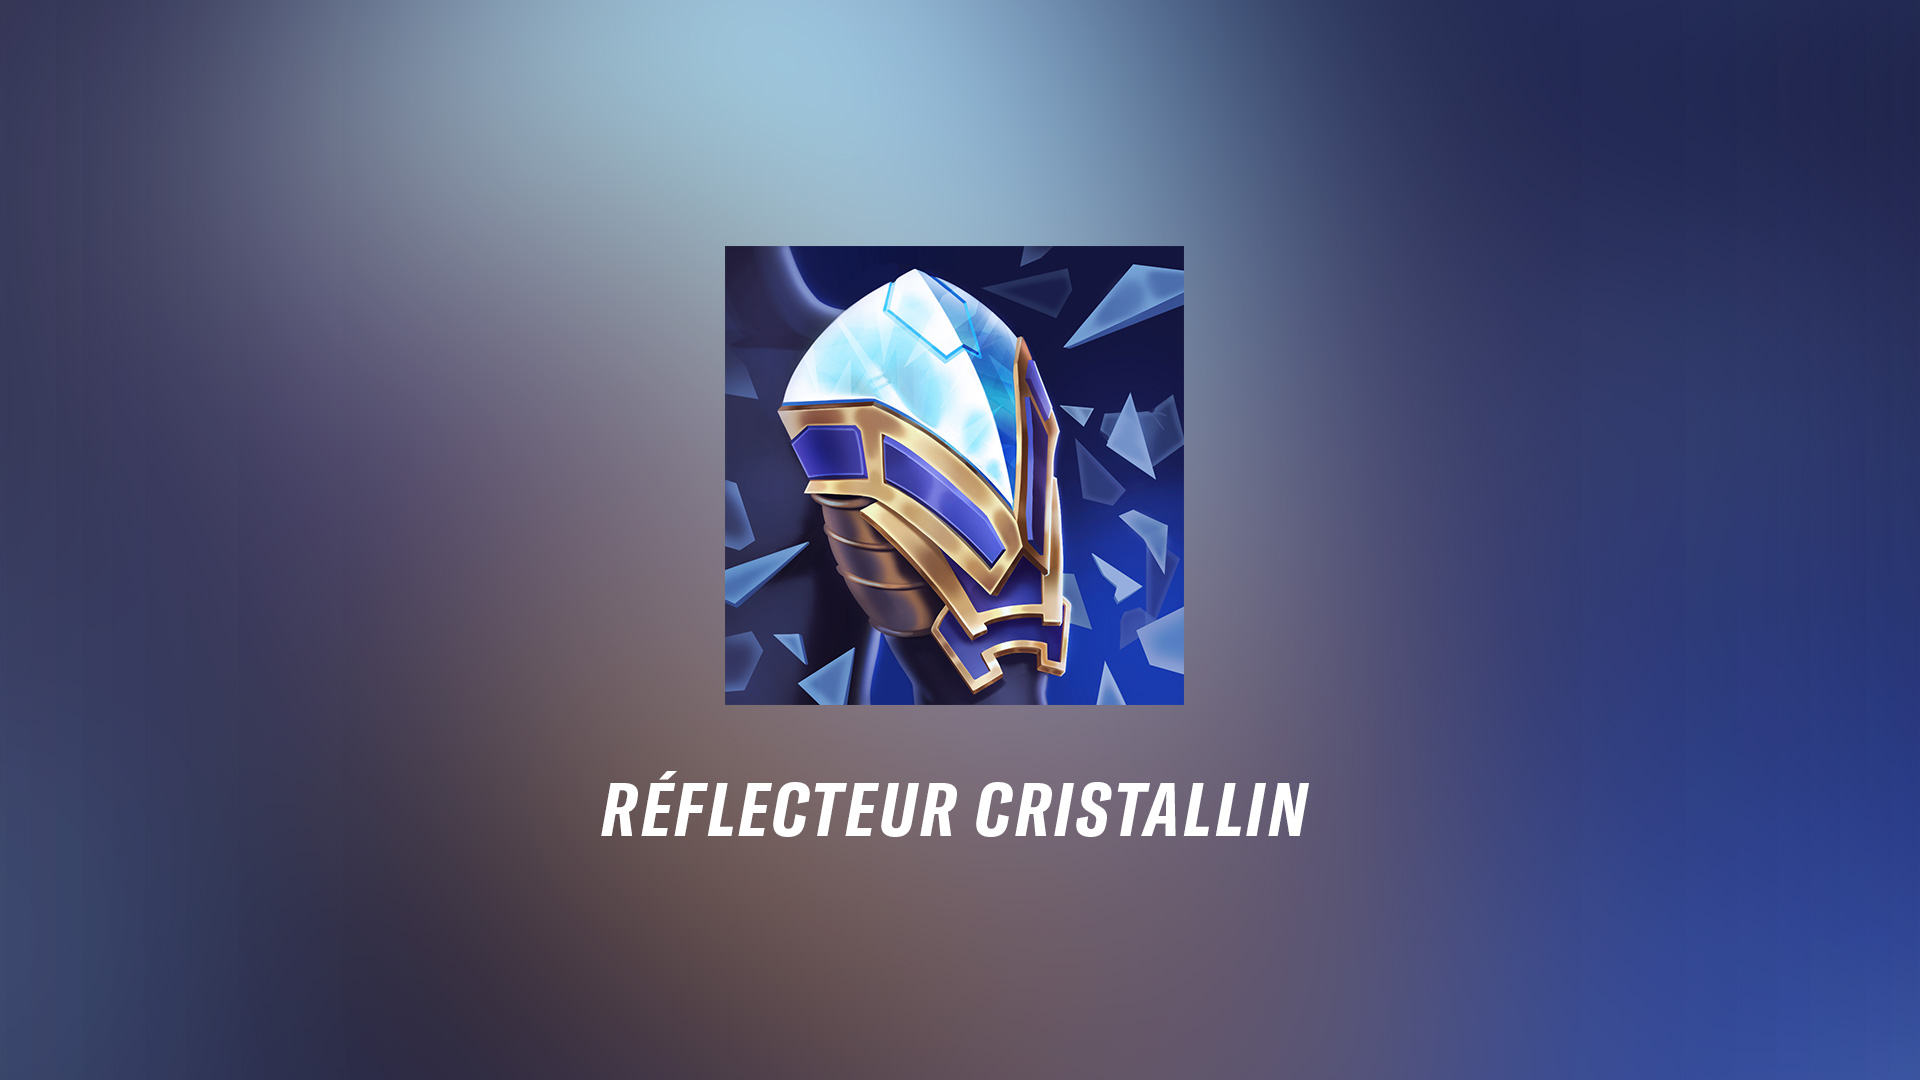 Crystalline_Reflector.jpg